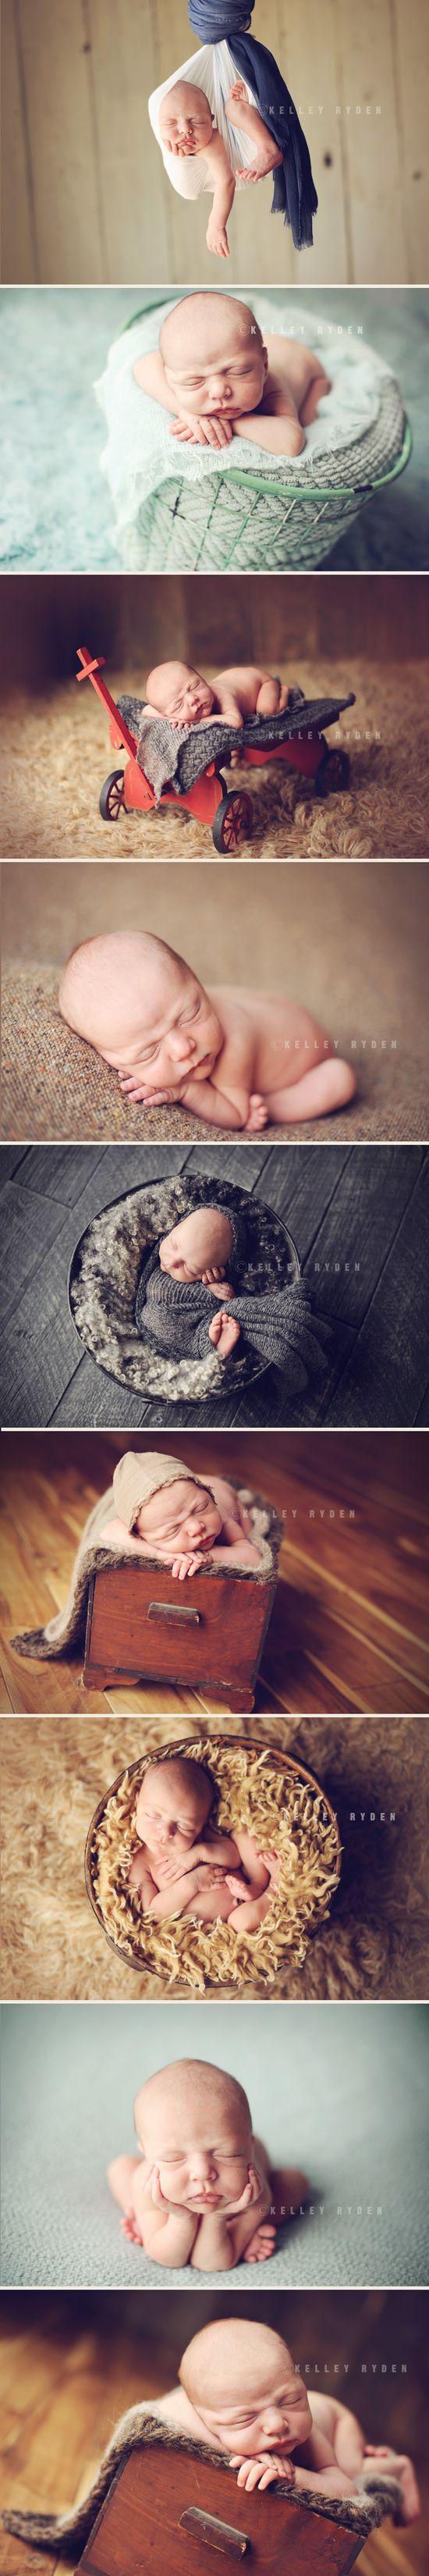 newborn boy posing and styling